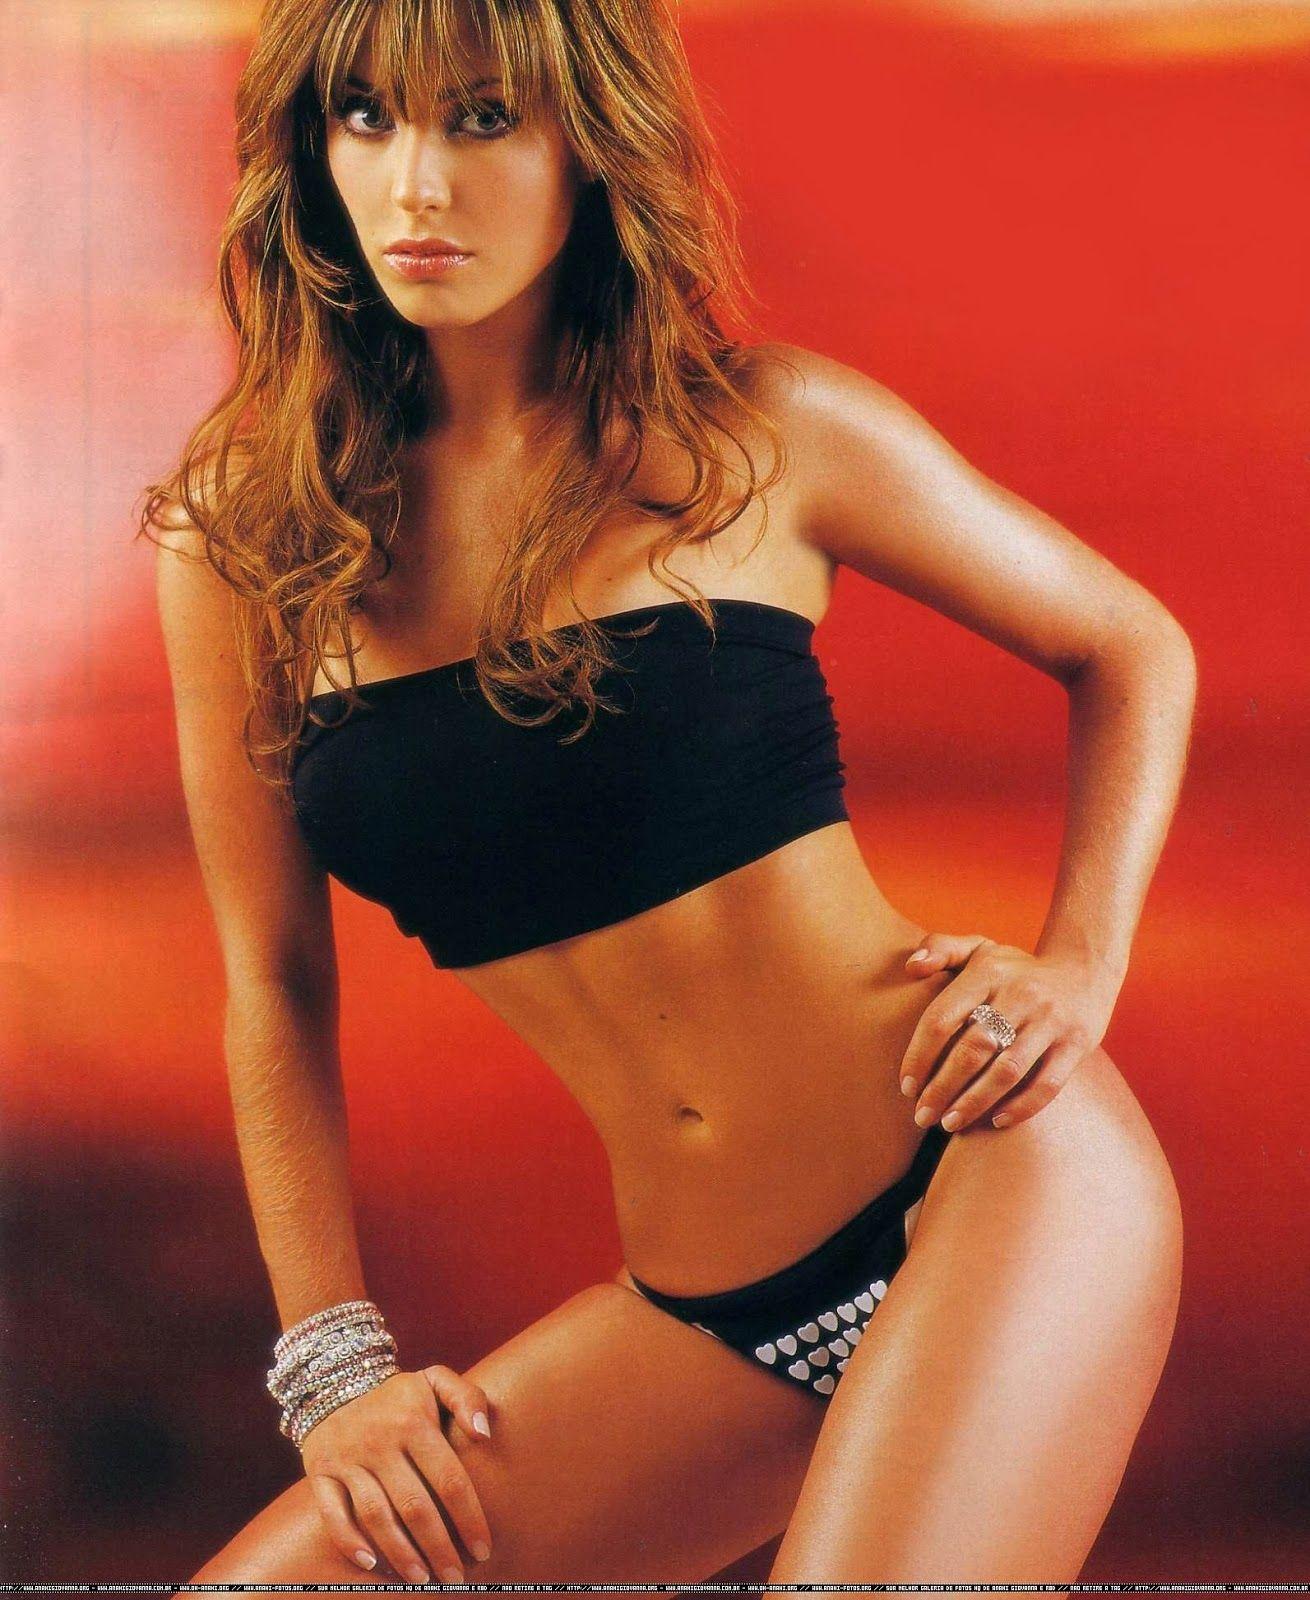 Anahi Hot rbd hot | rbd: fotos da anahí(mia colucci): | swimwear